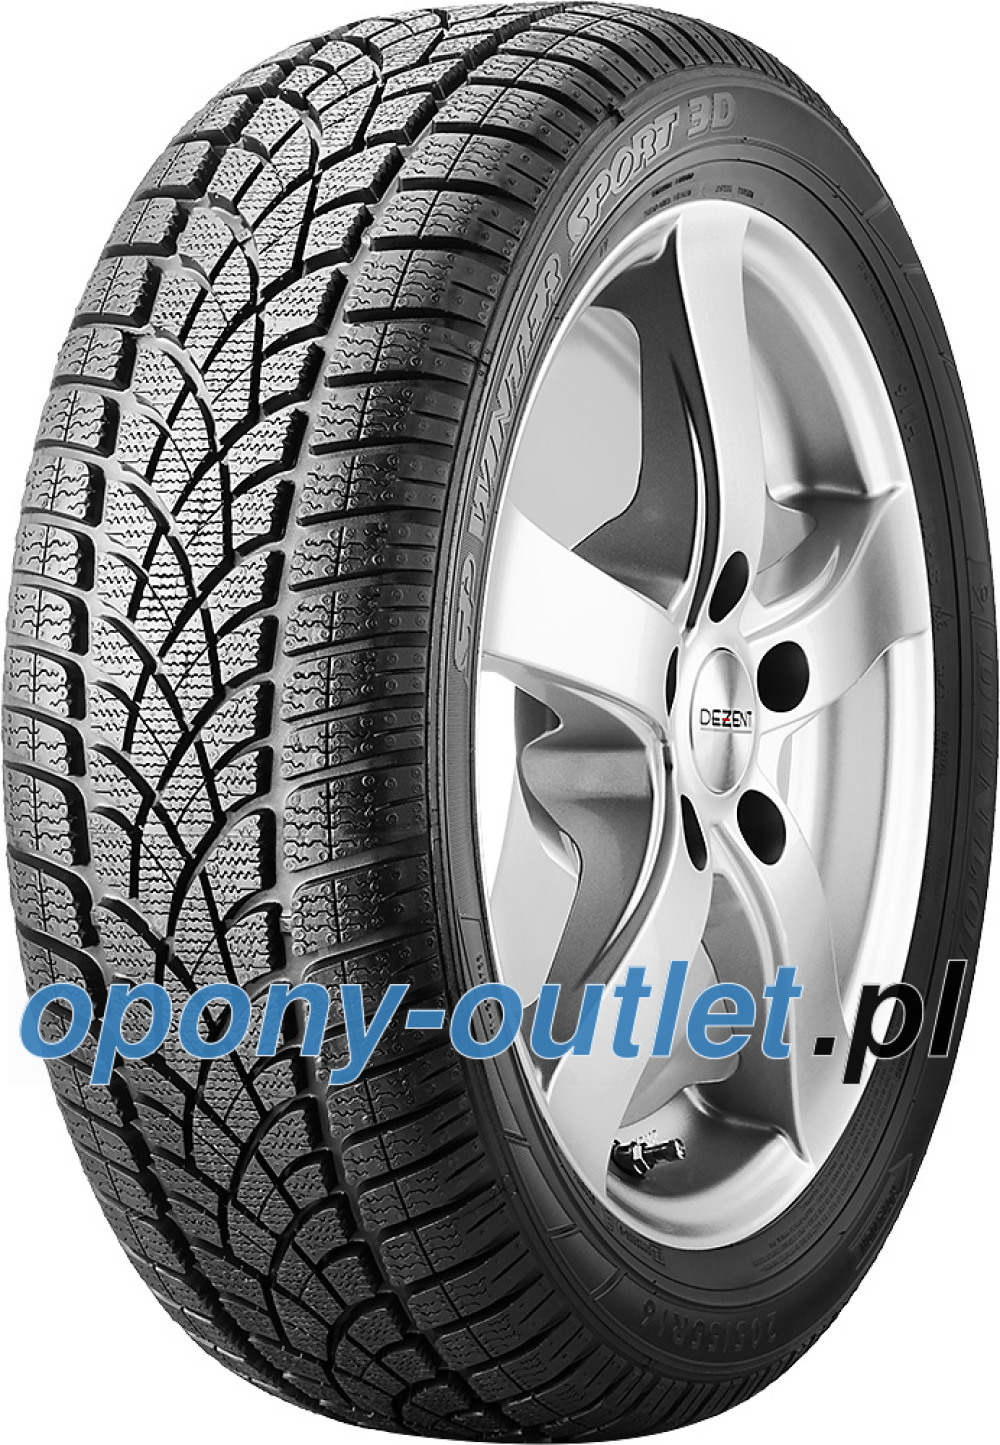 Dunlop SP Winter Sport 3D ( 255/45 R17 98V , MO, osłona felgi (MFS) )